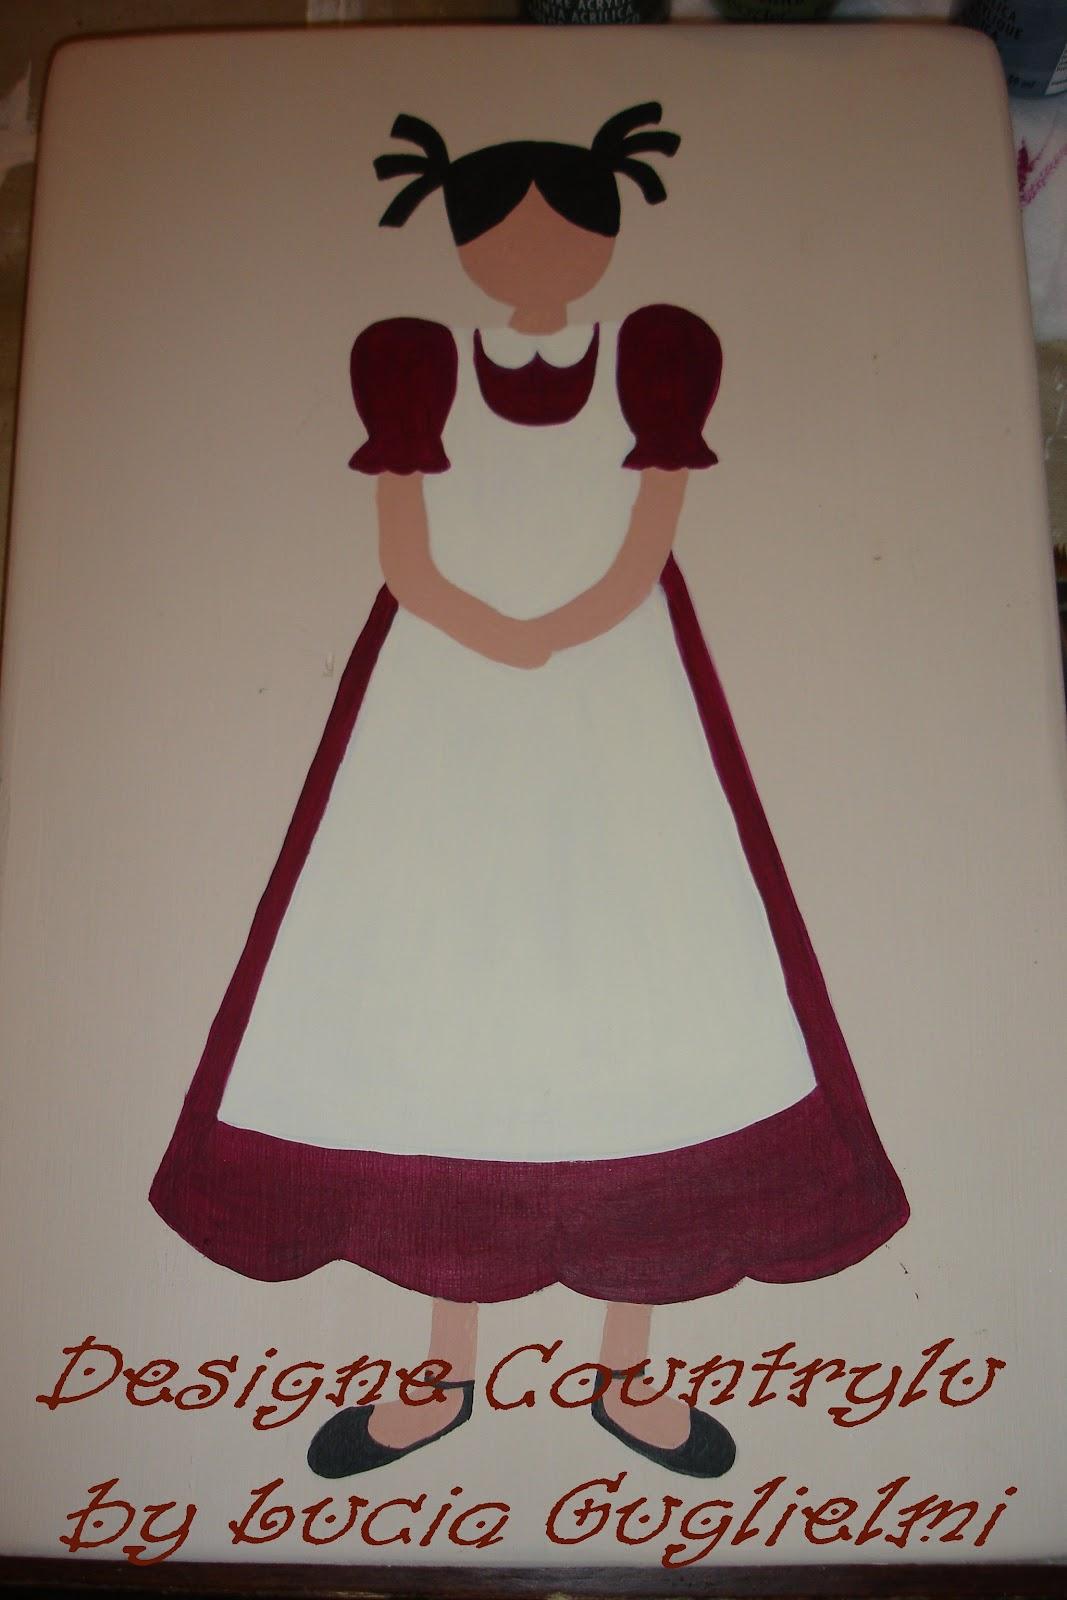 Popolare ♥ Countrylu ♥: Country painting free patternVi presento la  UW88